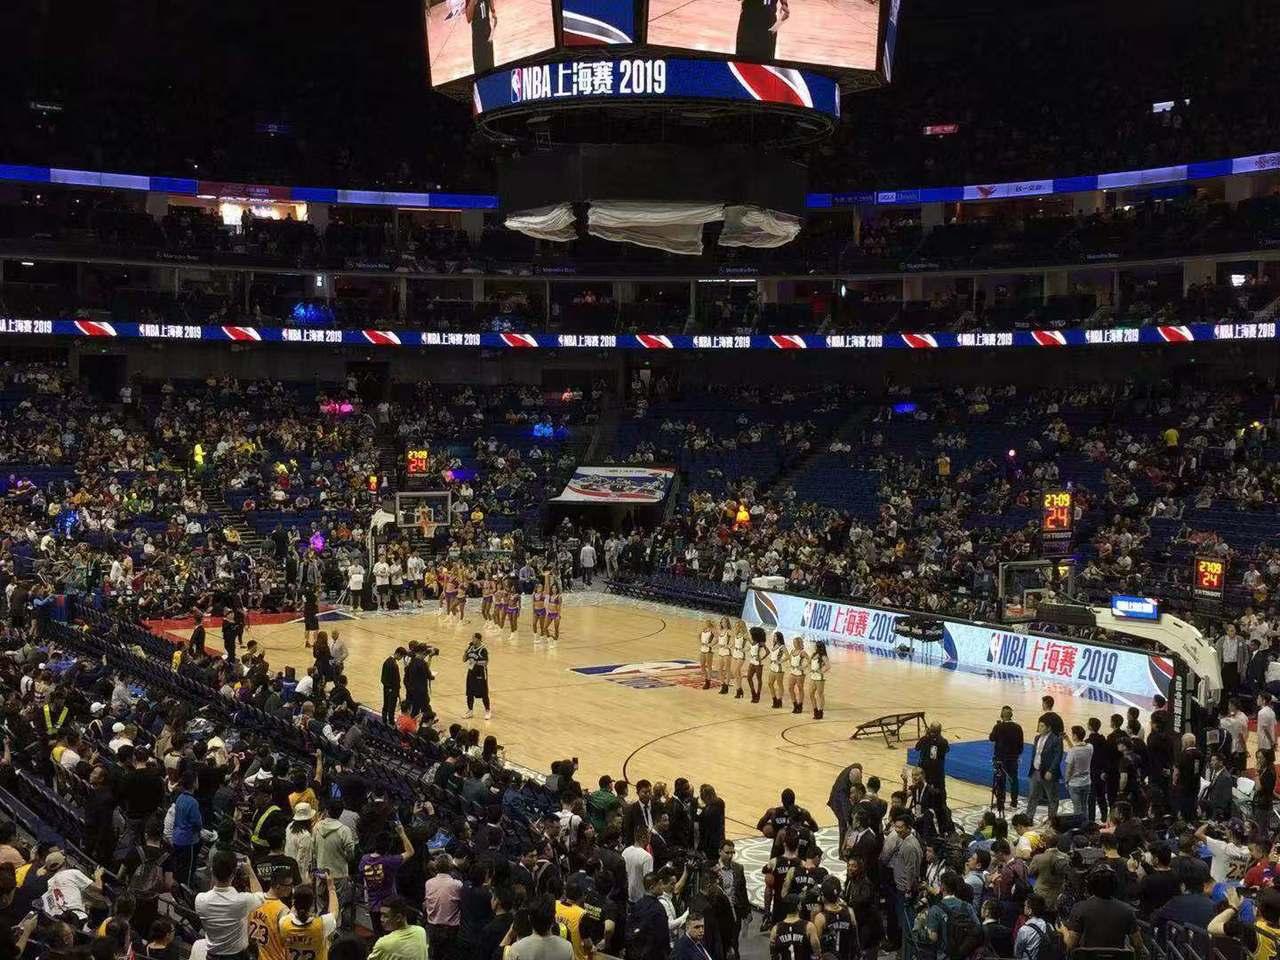 NBA中國賽首戰湖人VS籃網10日晚間在上海開賽,球迷「錢花了」,進場看球幾乎坐...